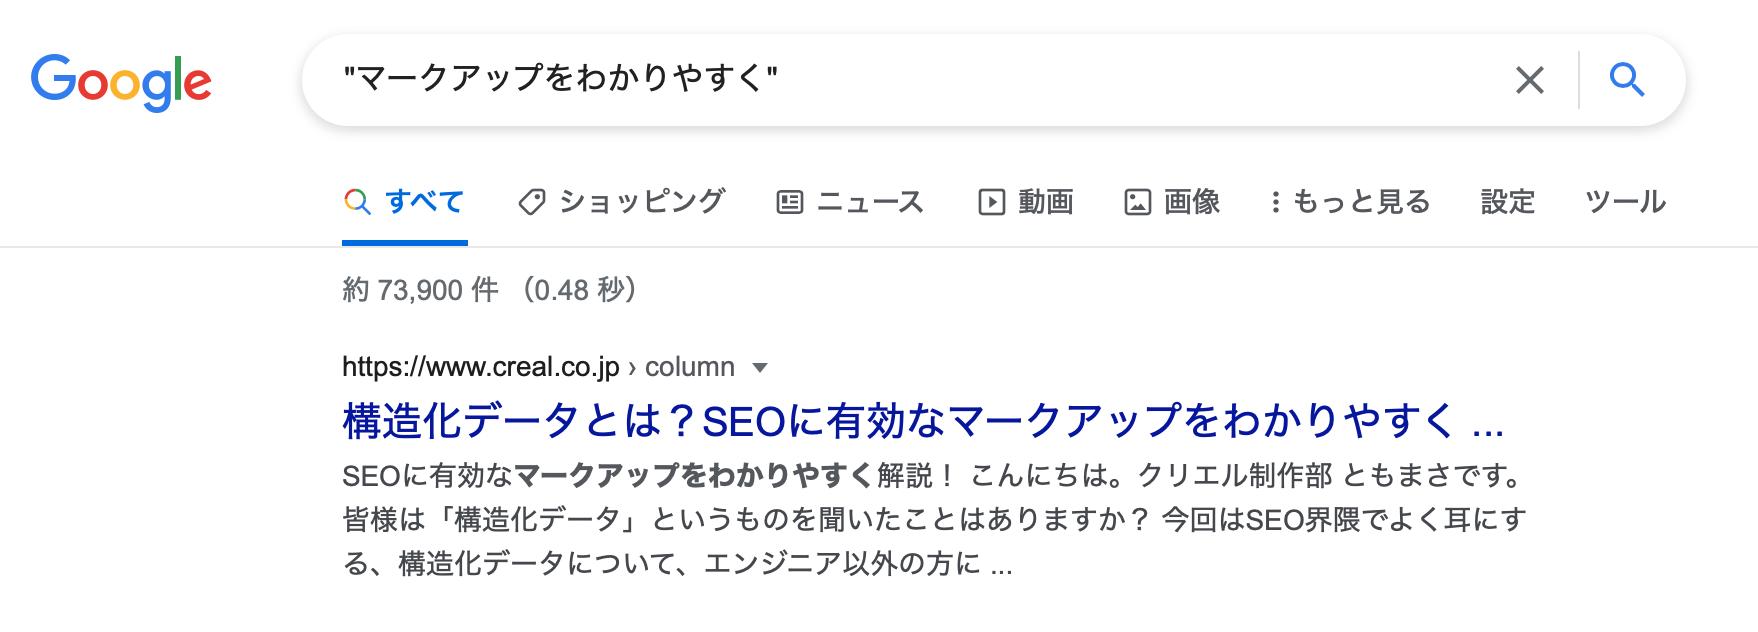 Google検索窓に入力された「完全一致検索」の例